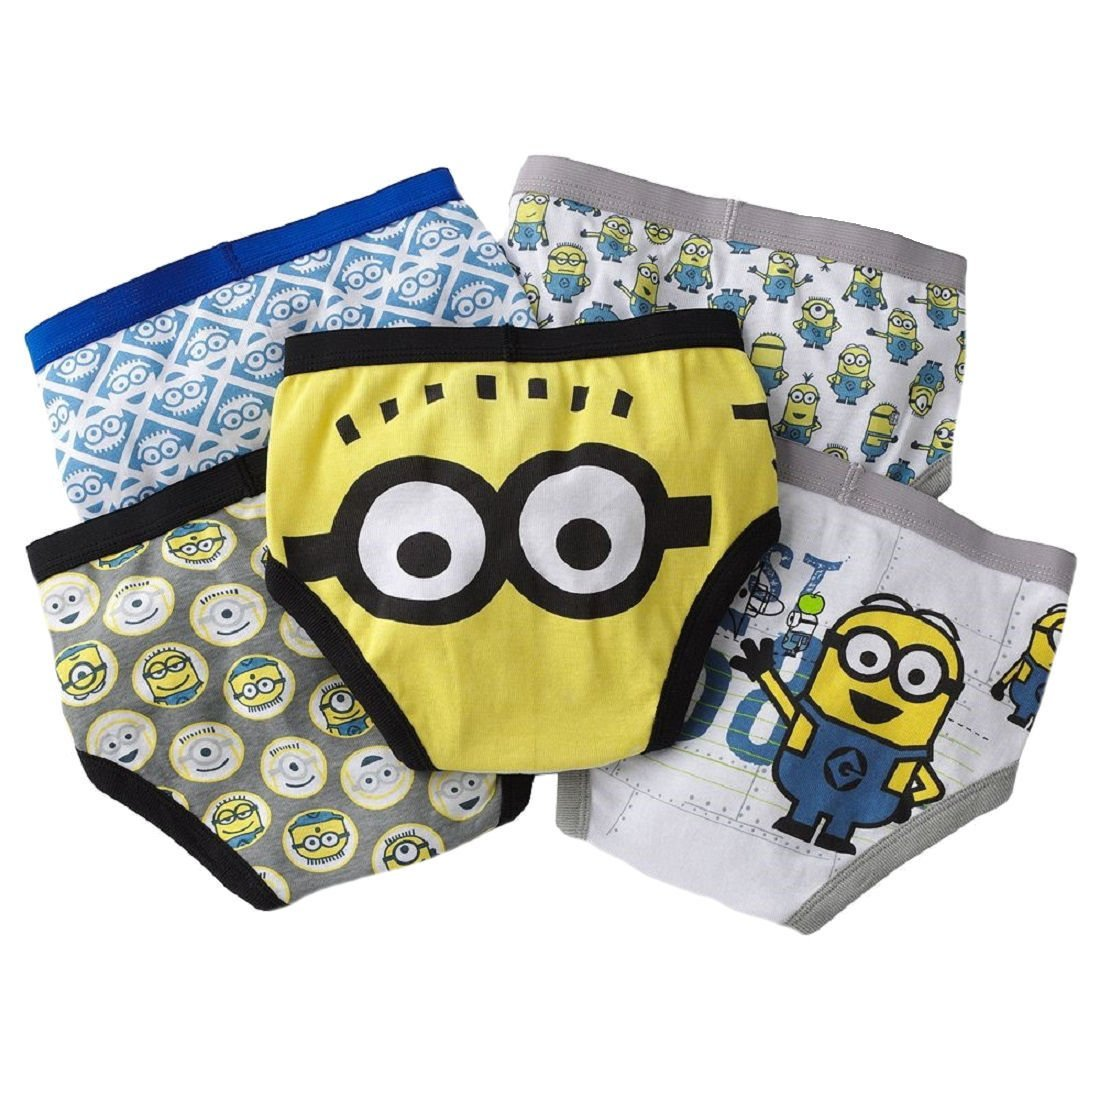 Despicable Me 2 Minion Boys Briefs, Underwear [Apparel], Assorted, Size 8